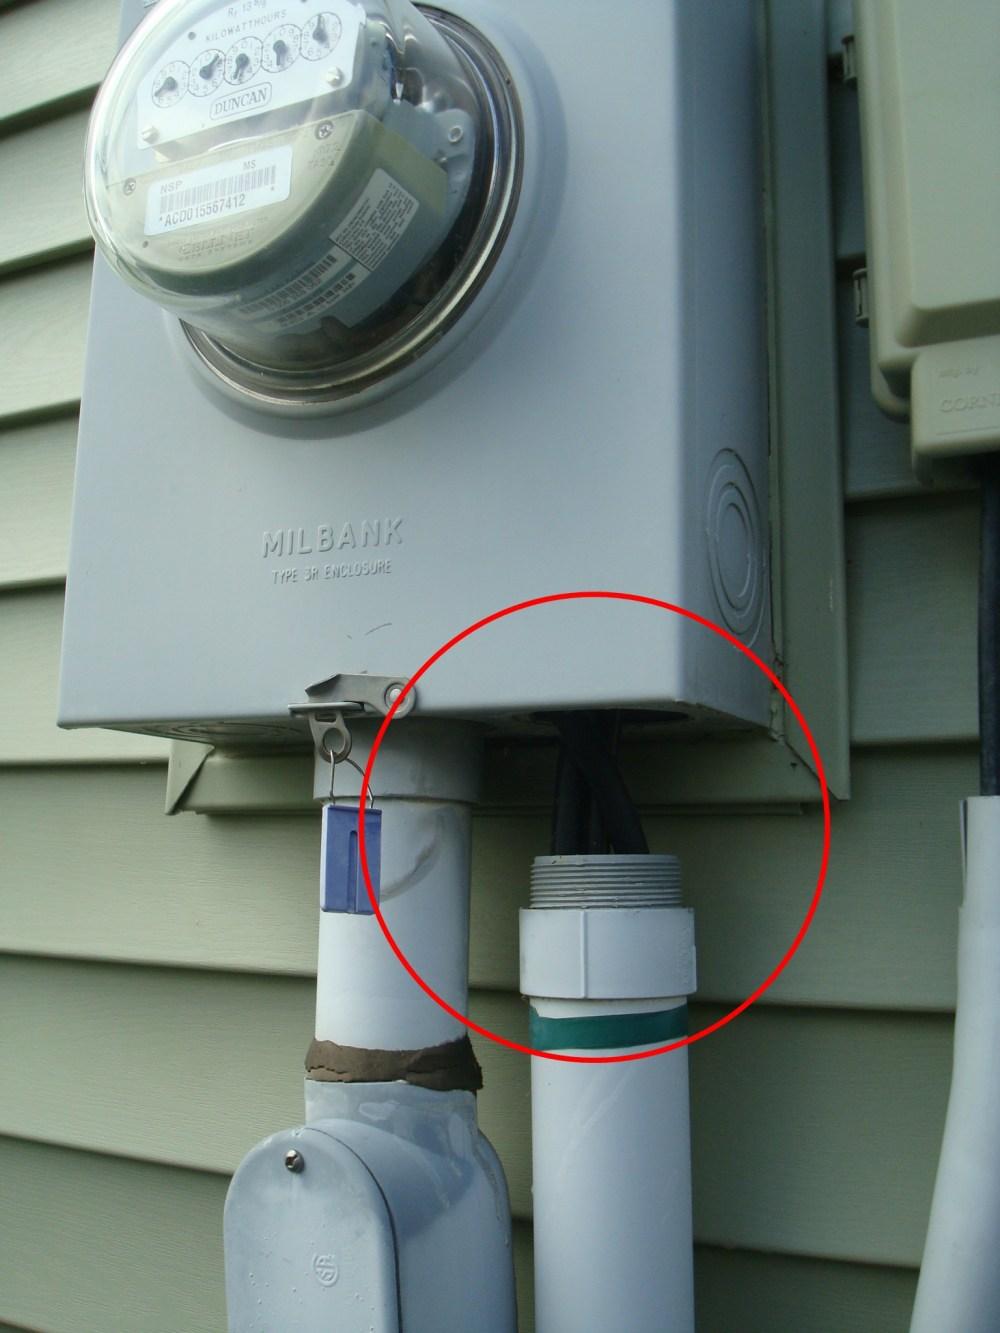 medium resolution of house meter box wiring simple wiring schema 4 wire service entrance wiring house meter box wiring